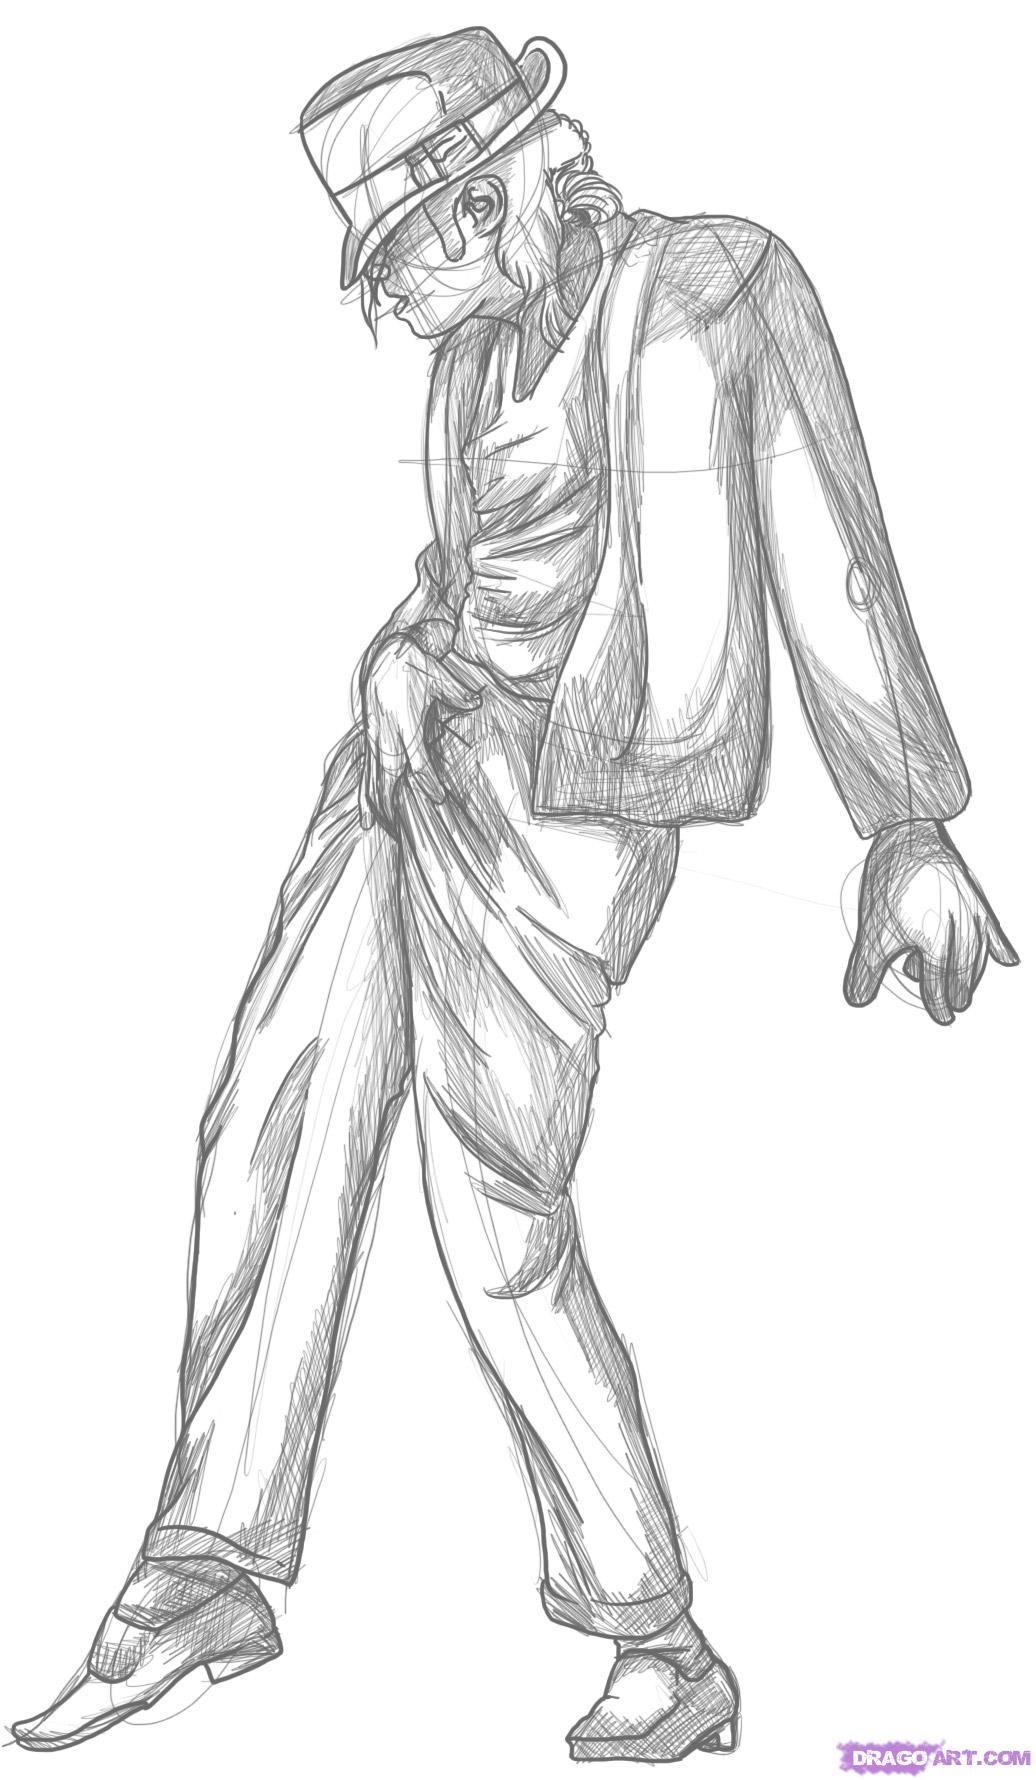 Drawing of michael jackson